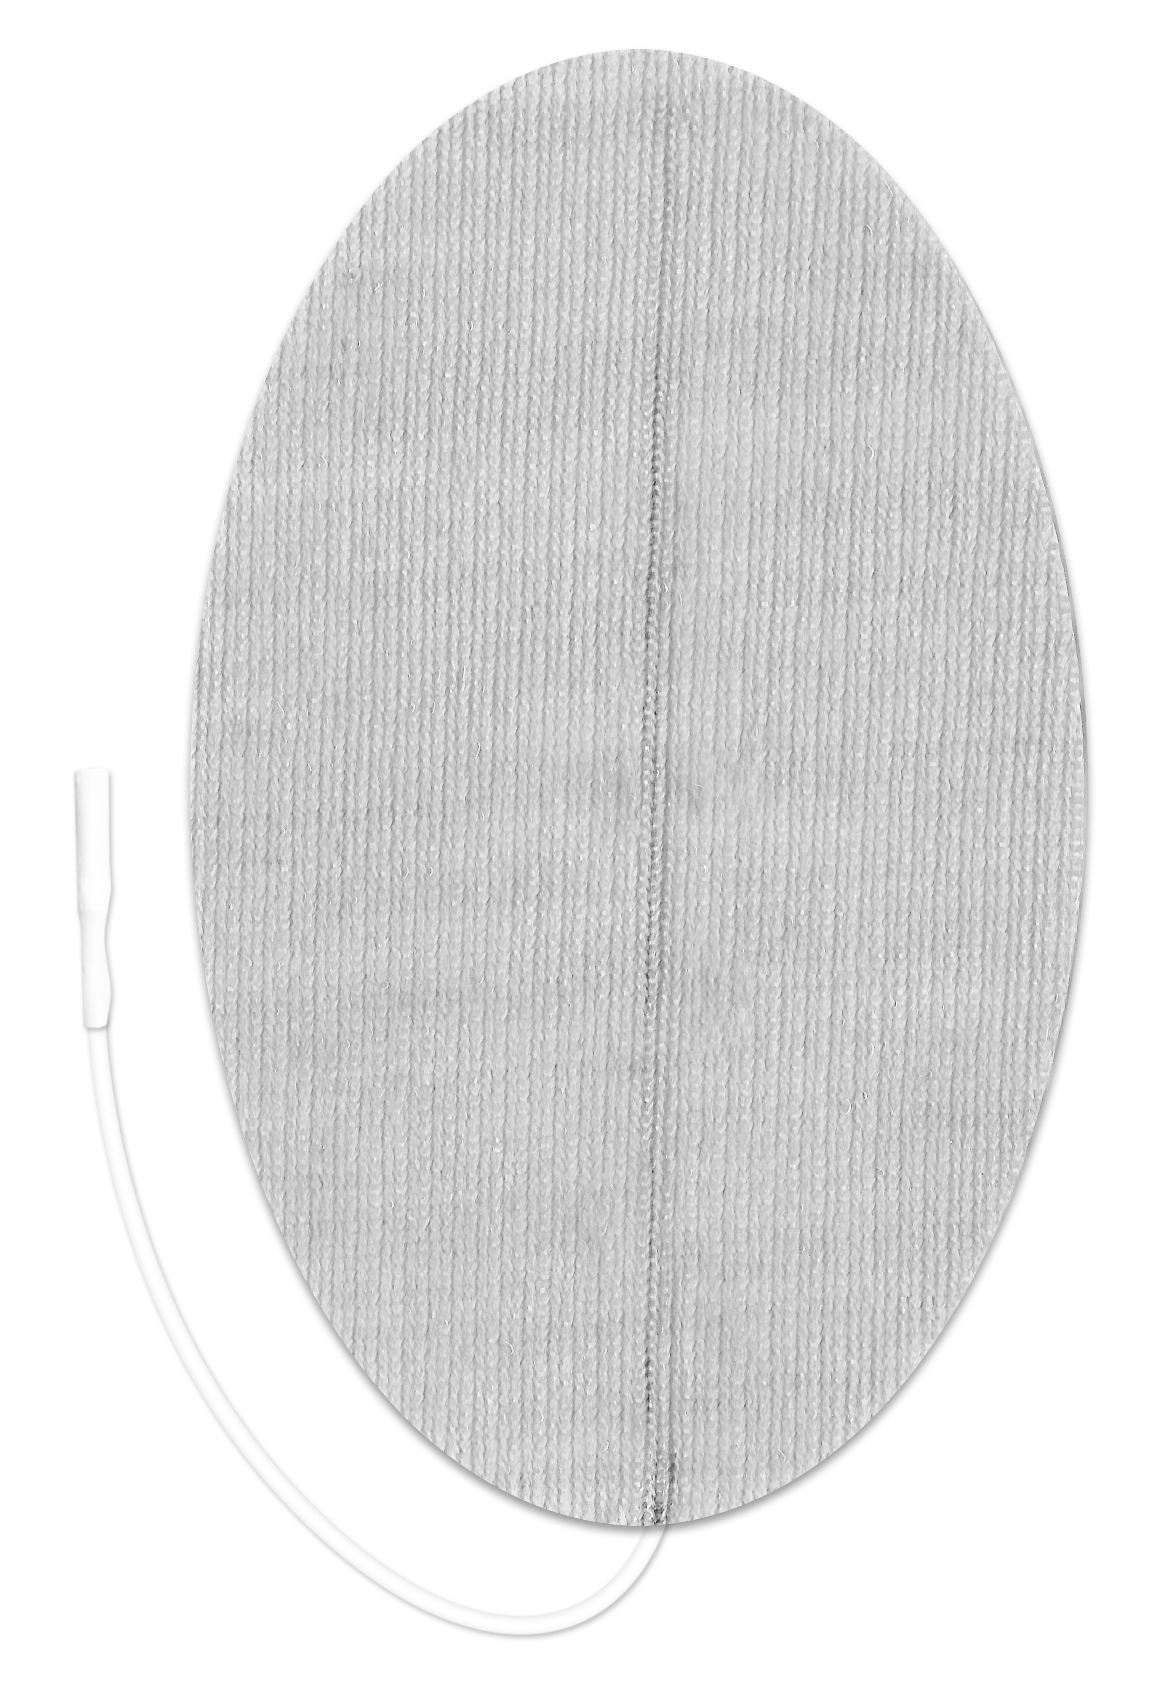 PALS 4x6 cm